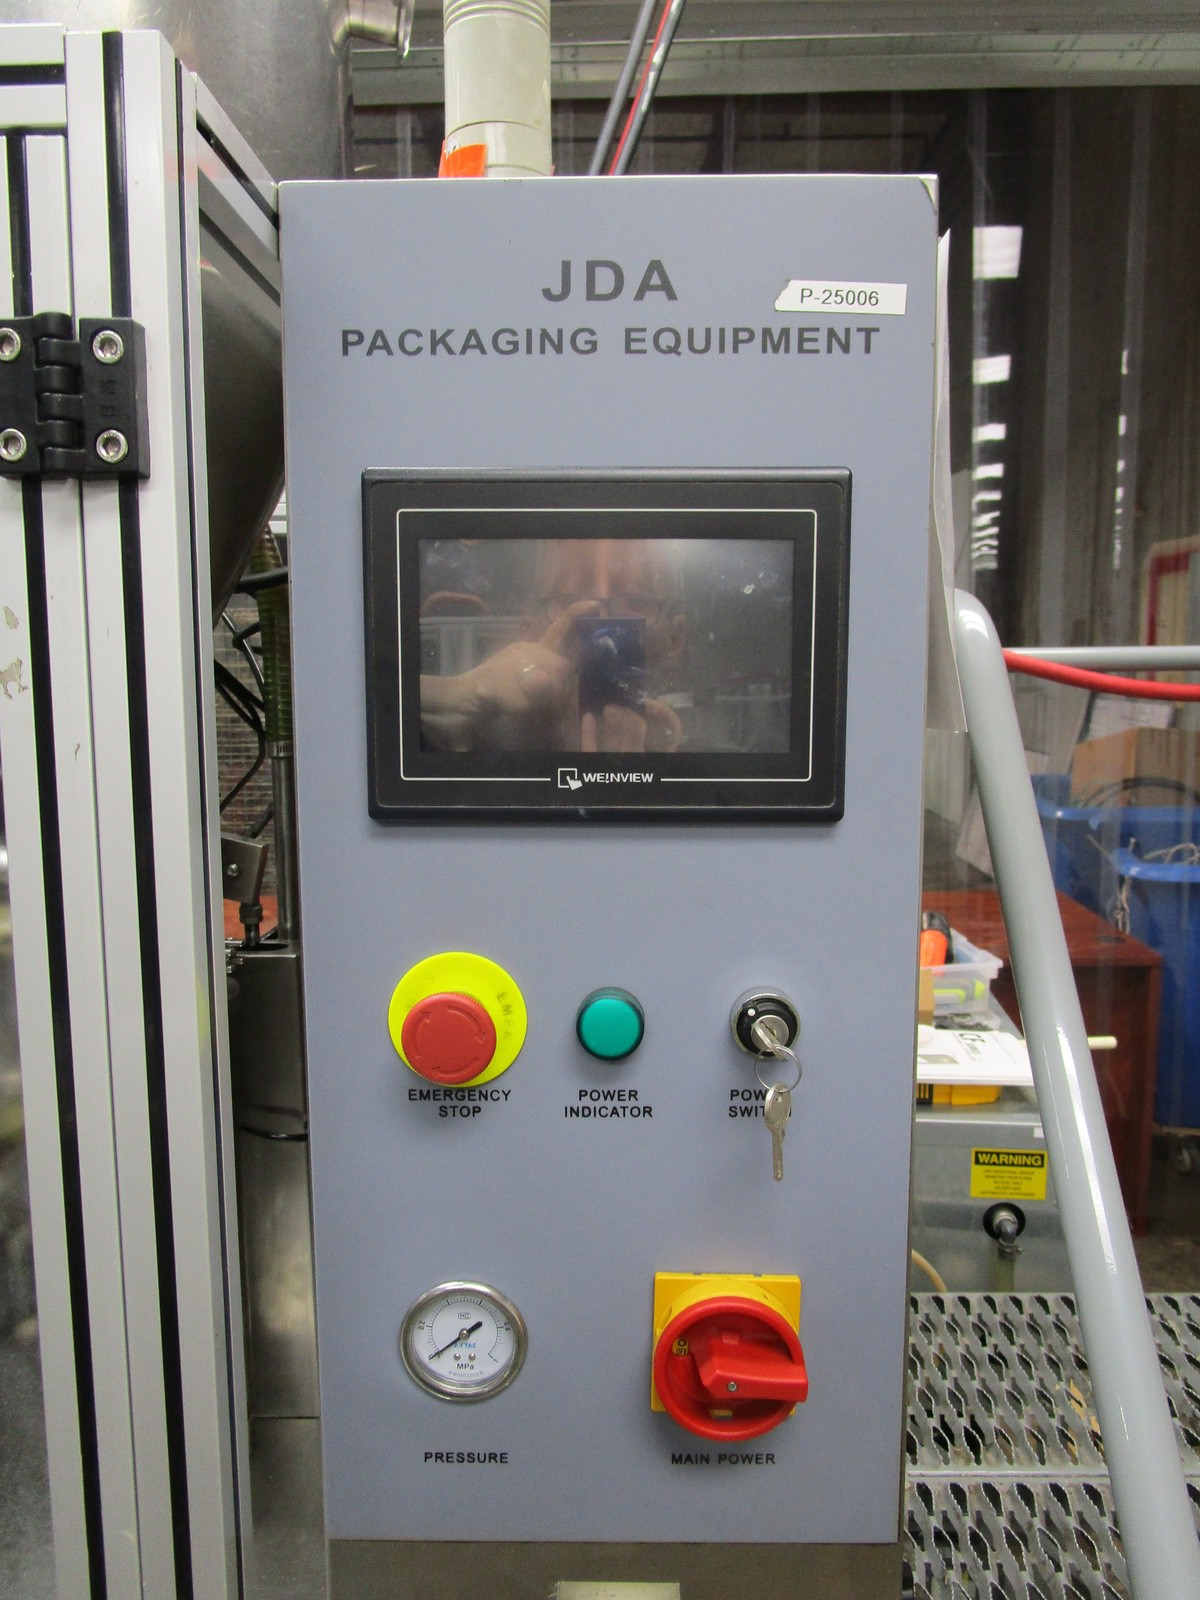 2013 JDA Packaging Equipment Super 30 Automatic Tube Filler s/n 150113, Conveyor, Hopper | Rig Fee: - Image 7 of 12